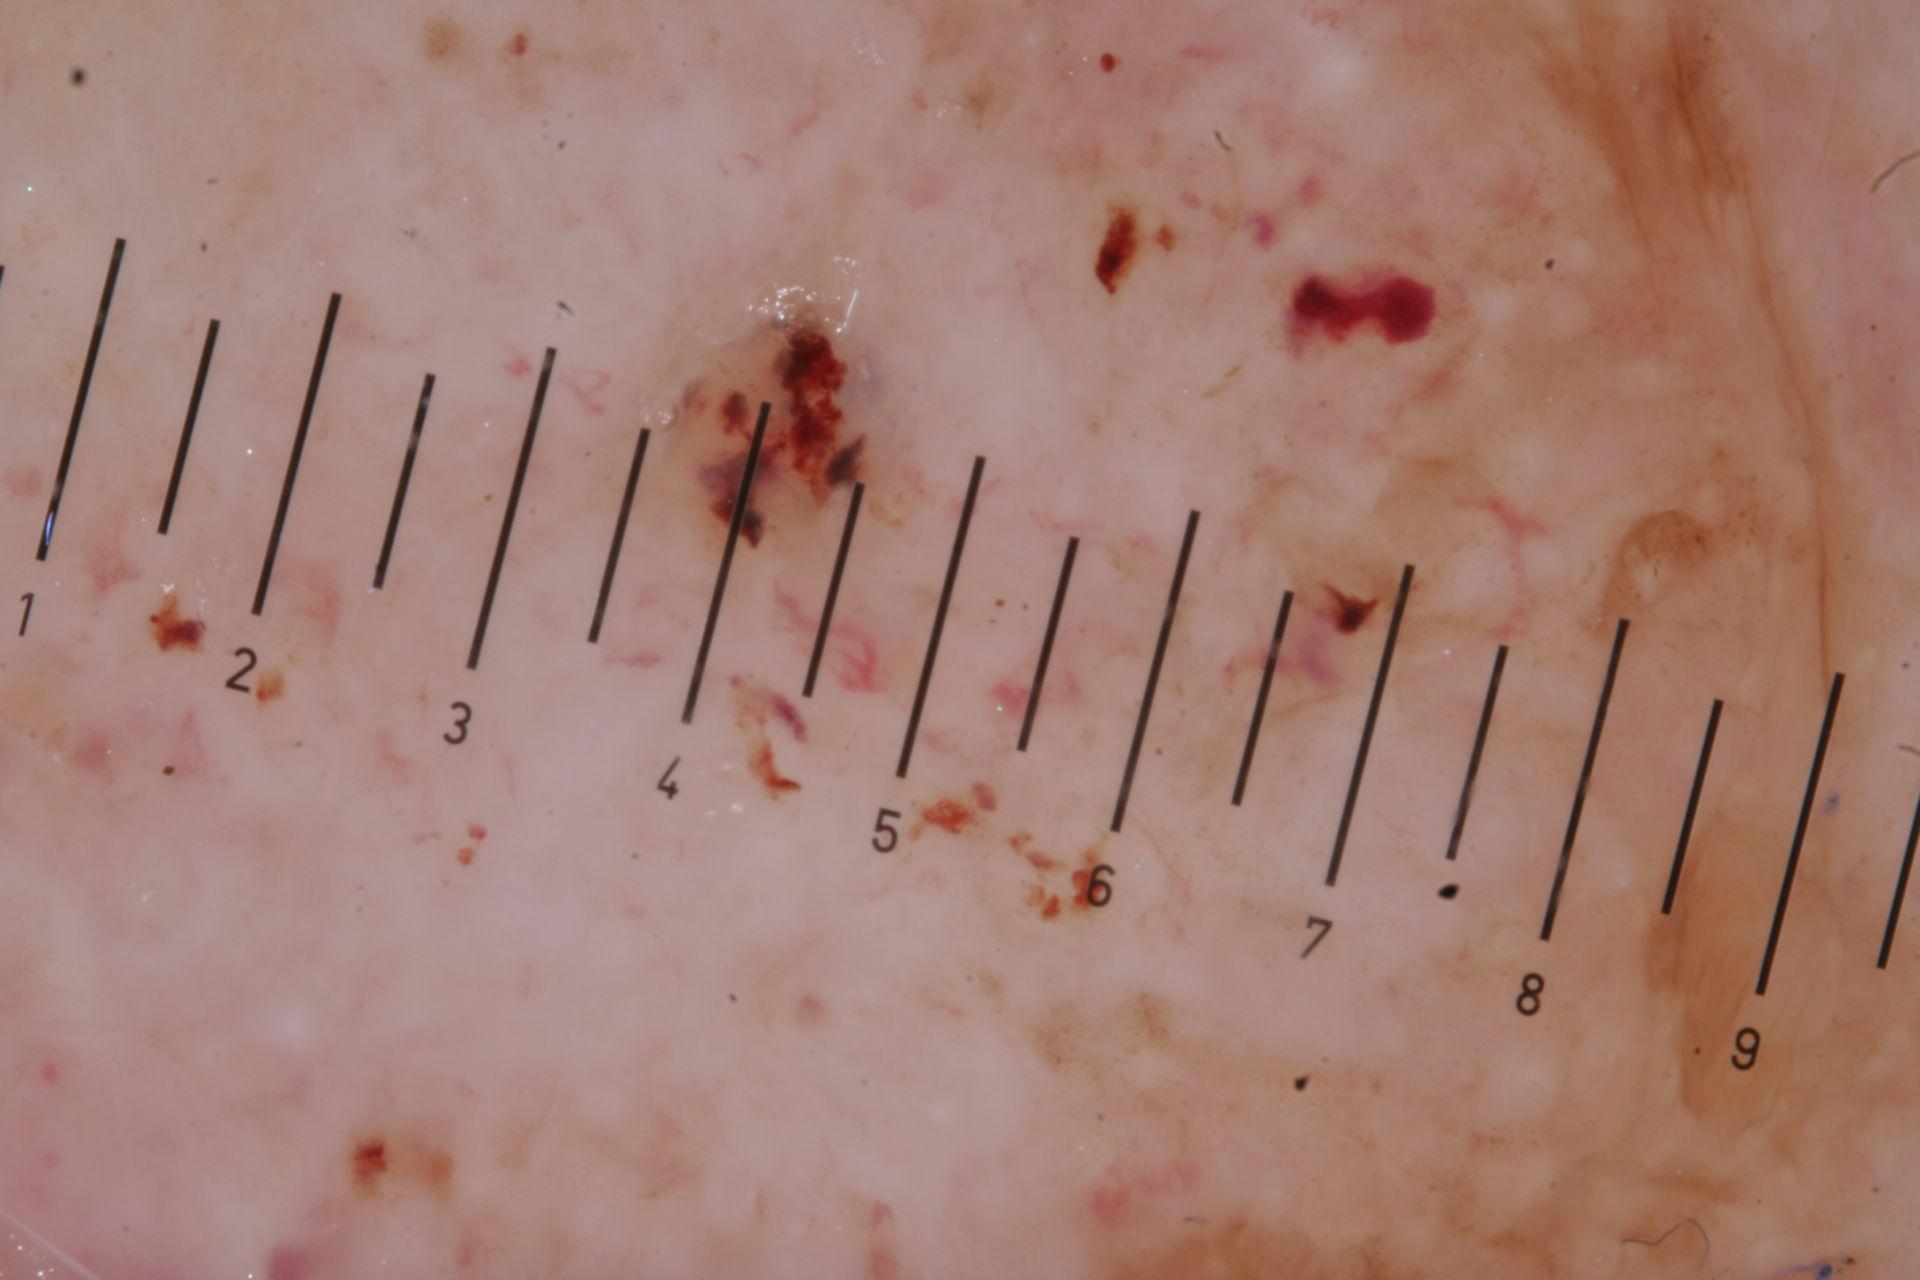 Carcinoma basal celular